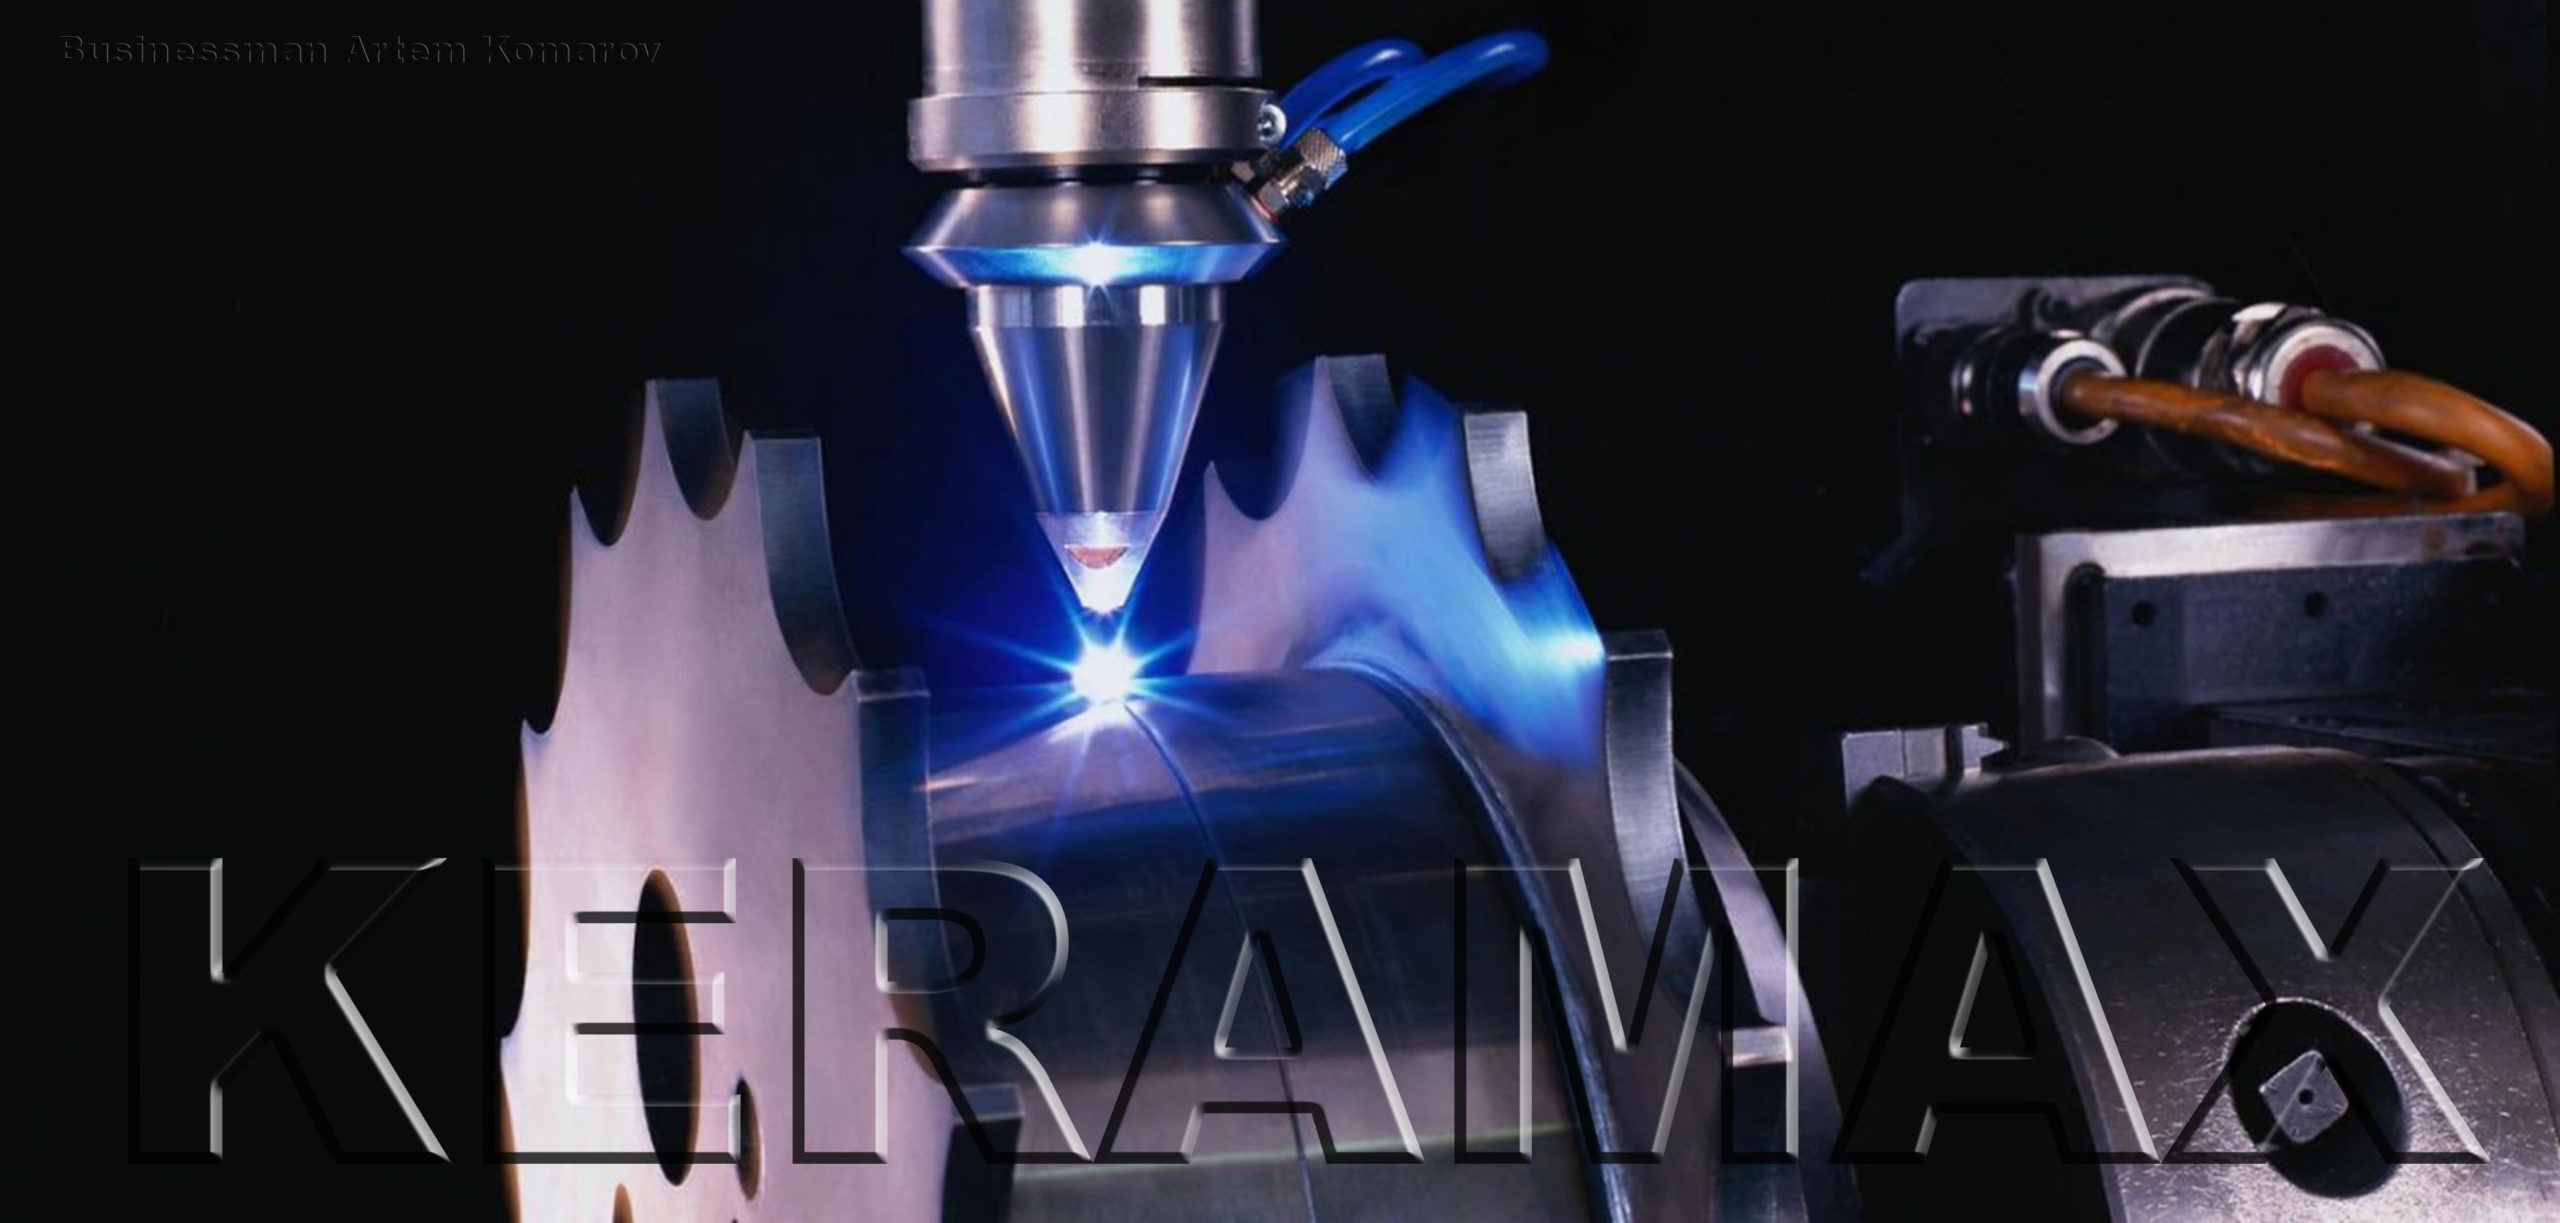 Artem Komarov Laser welding